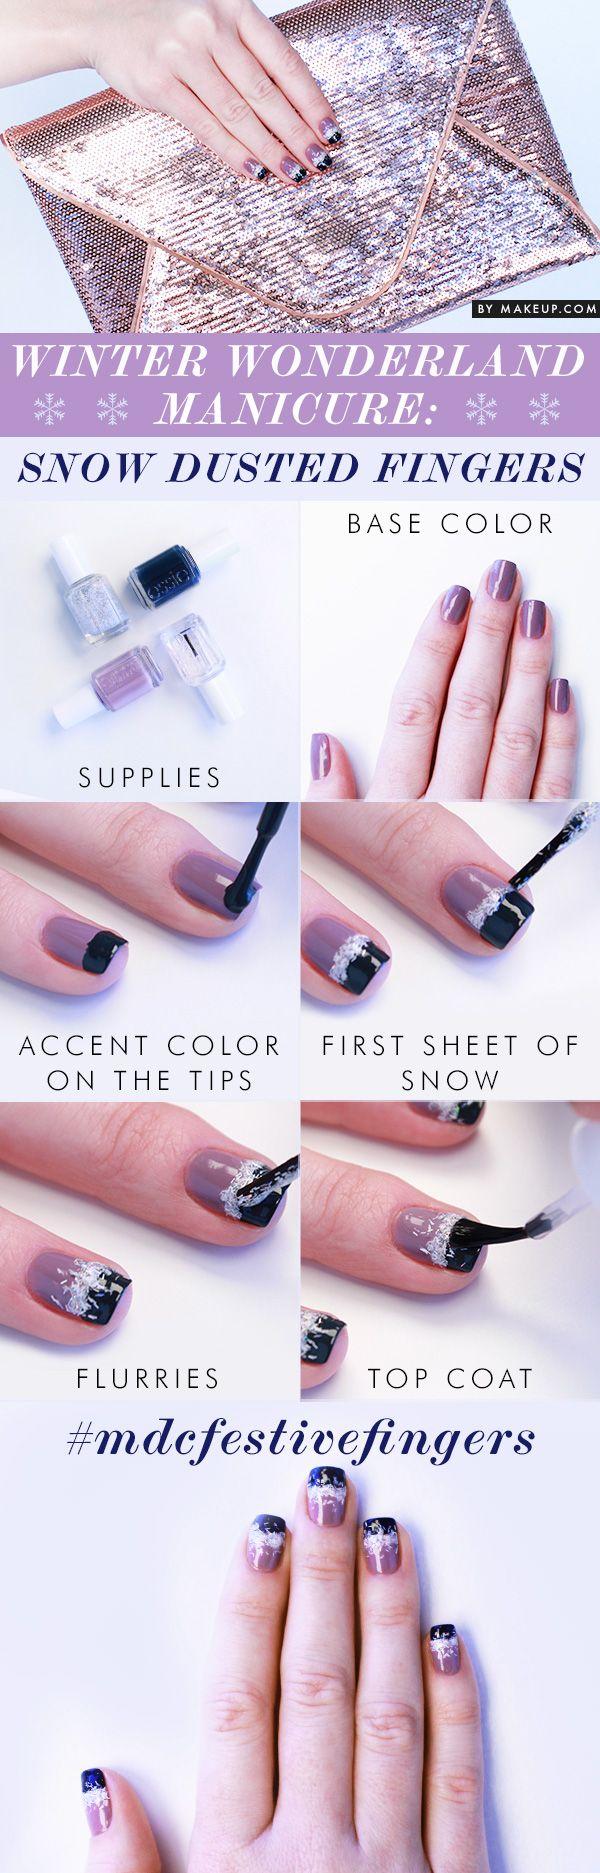 Festive Fingers Holiday Giveaway + Nail tutorial #nailart